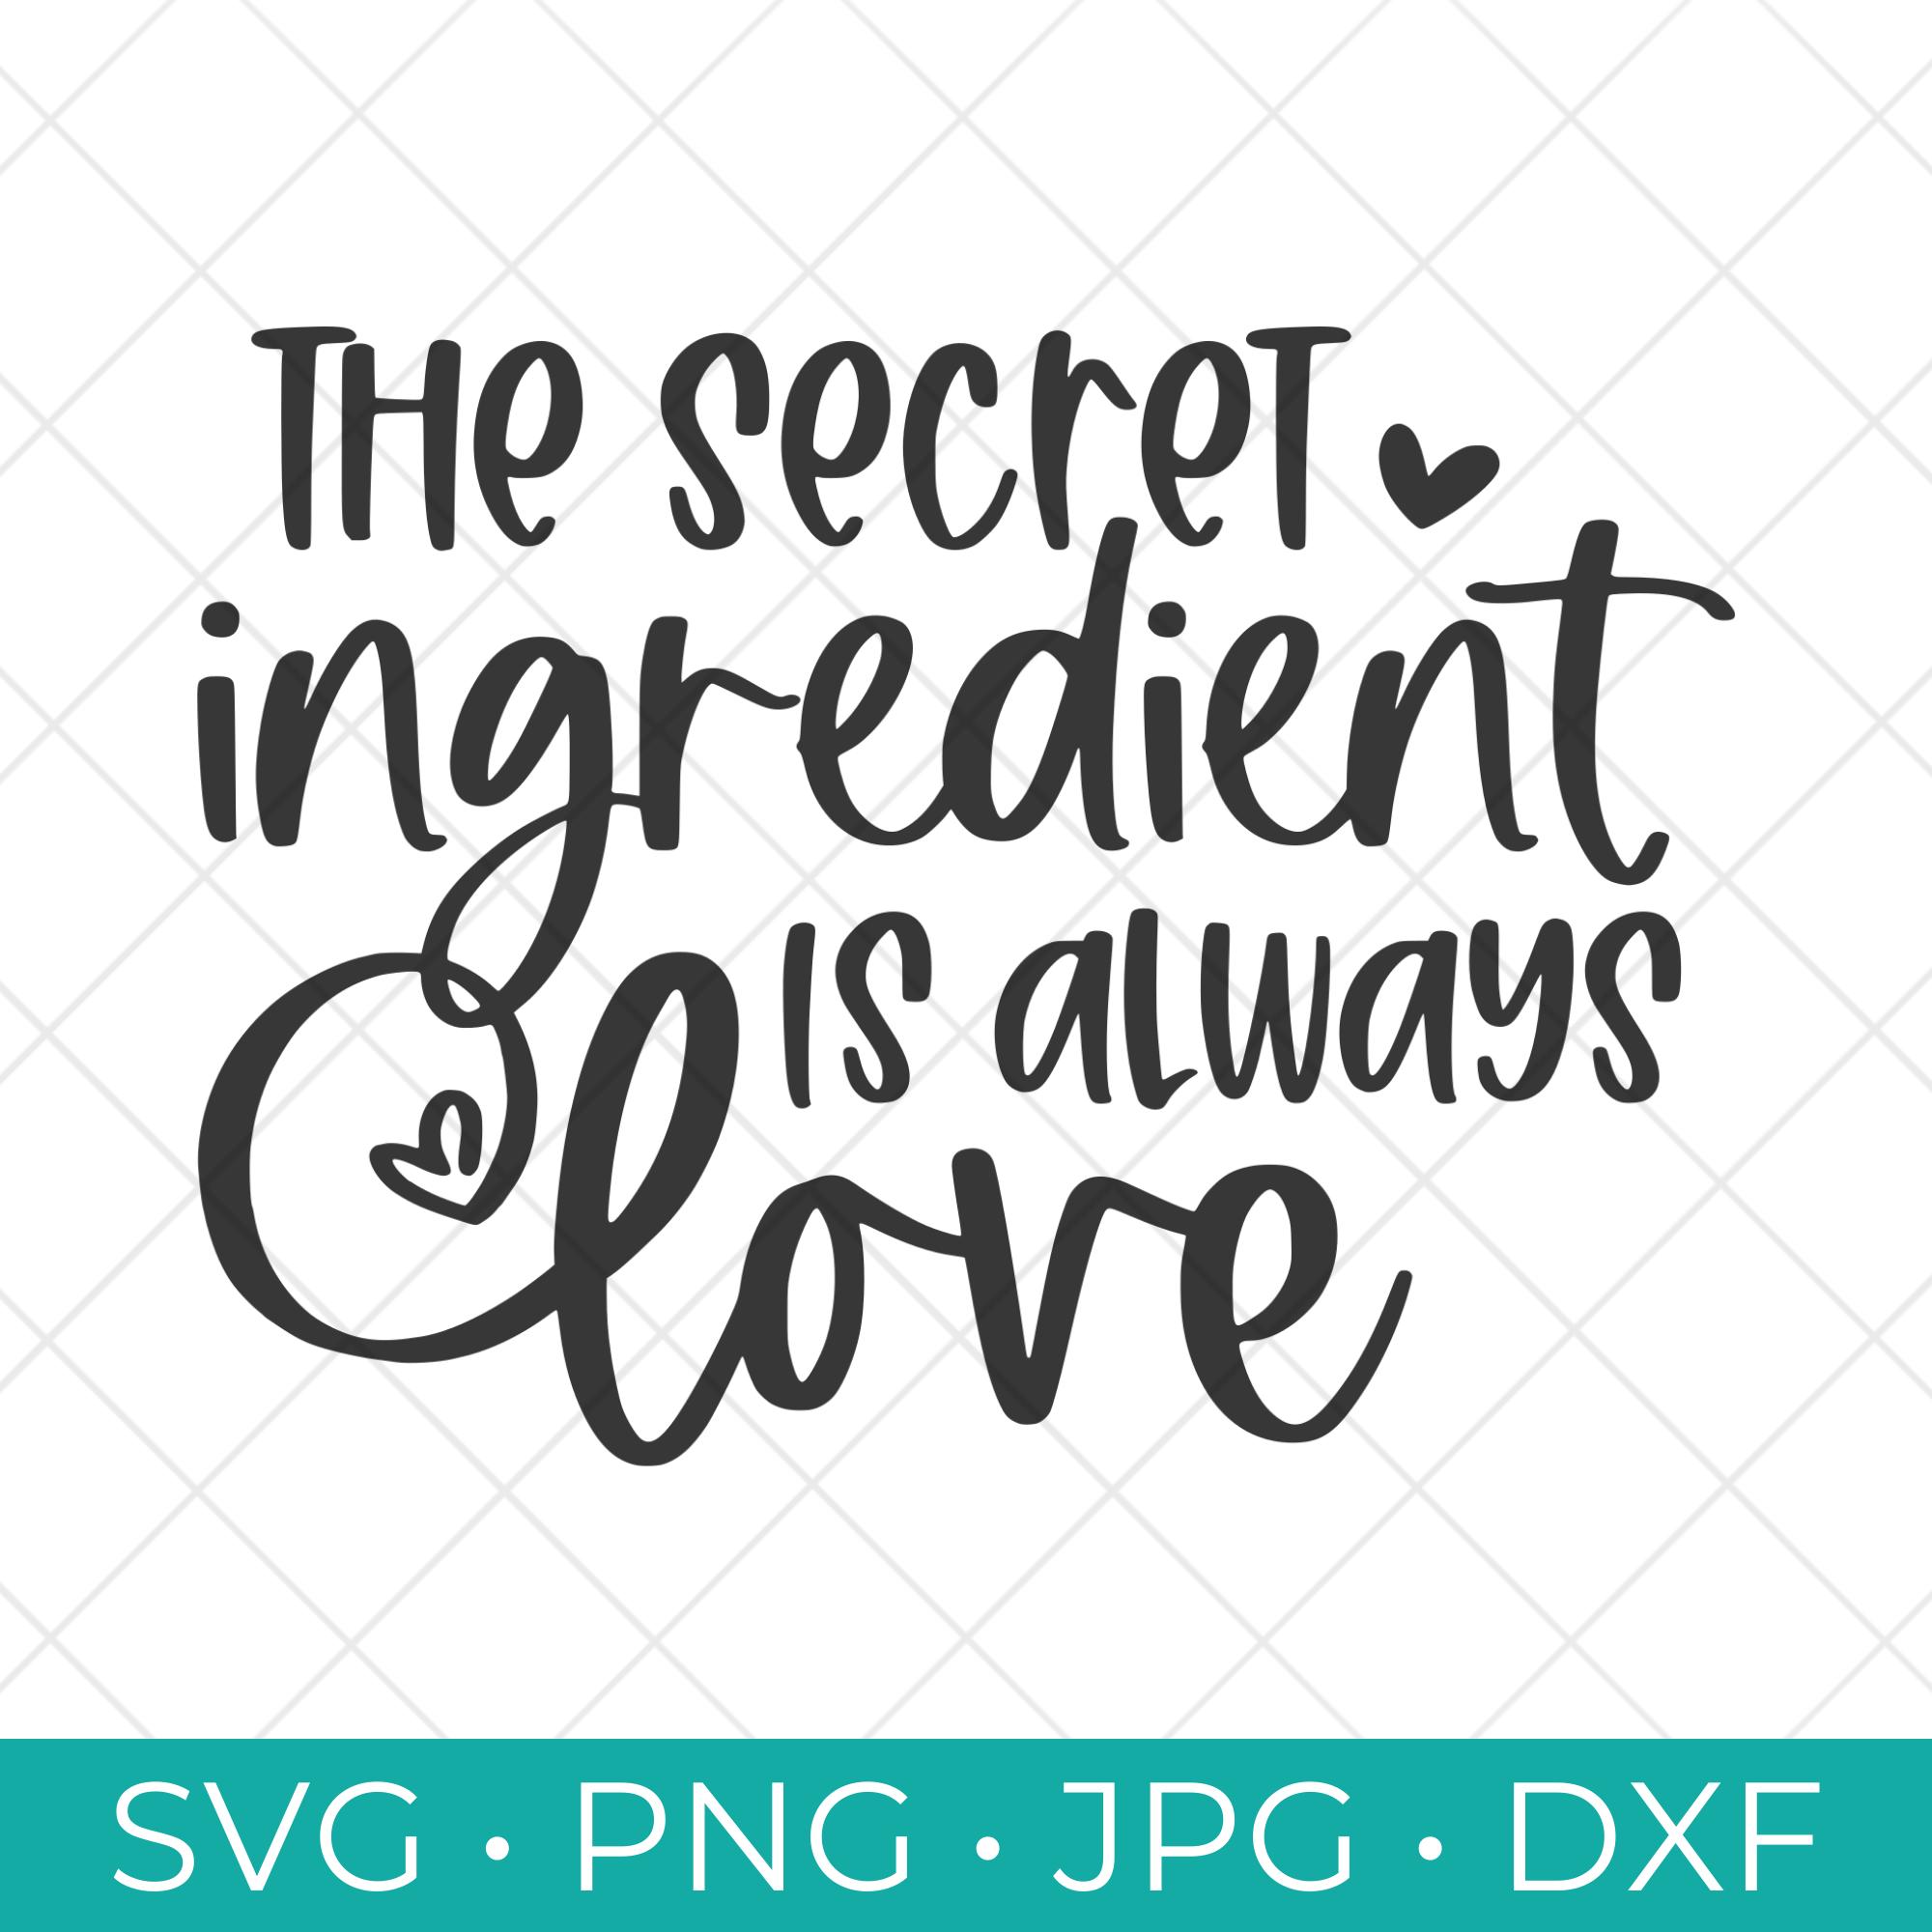 The Secret Ingredient is Always Love SVG Cut File